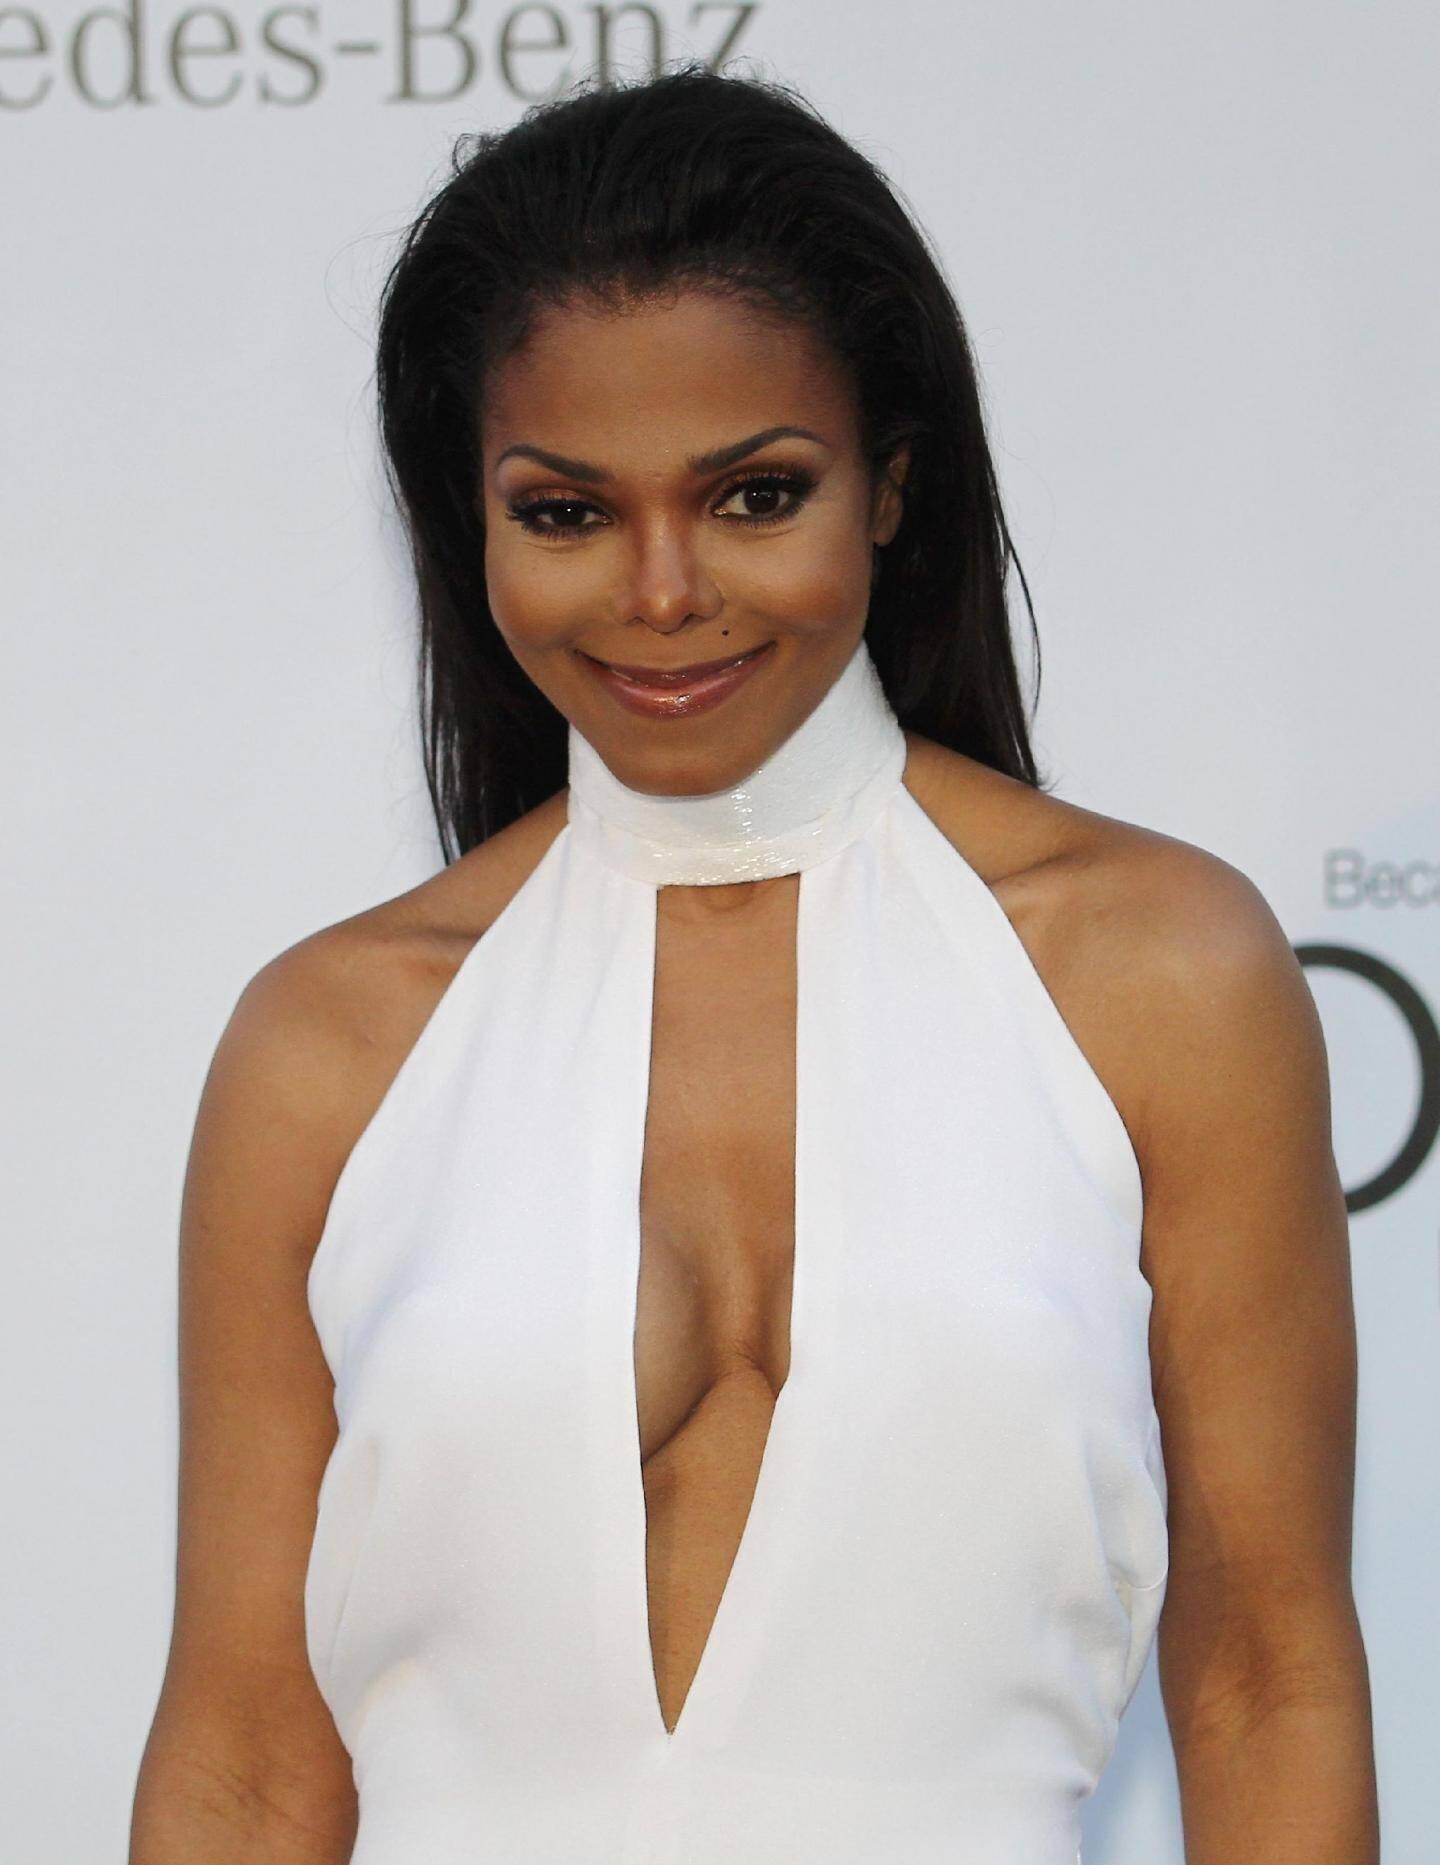 Dans une robe blanche super sexy, Janet Jackson est apparue hier soir.